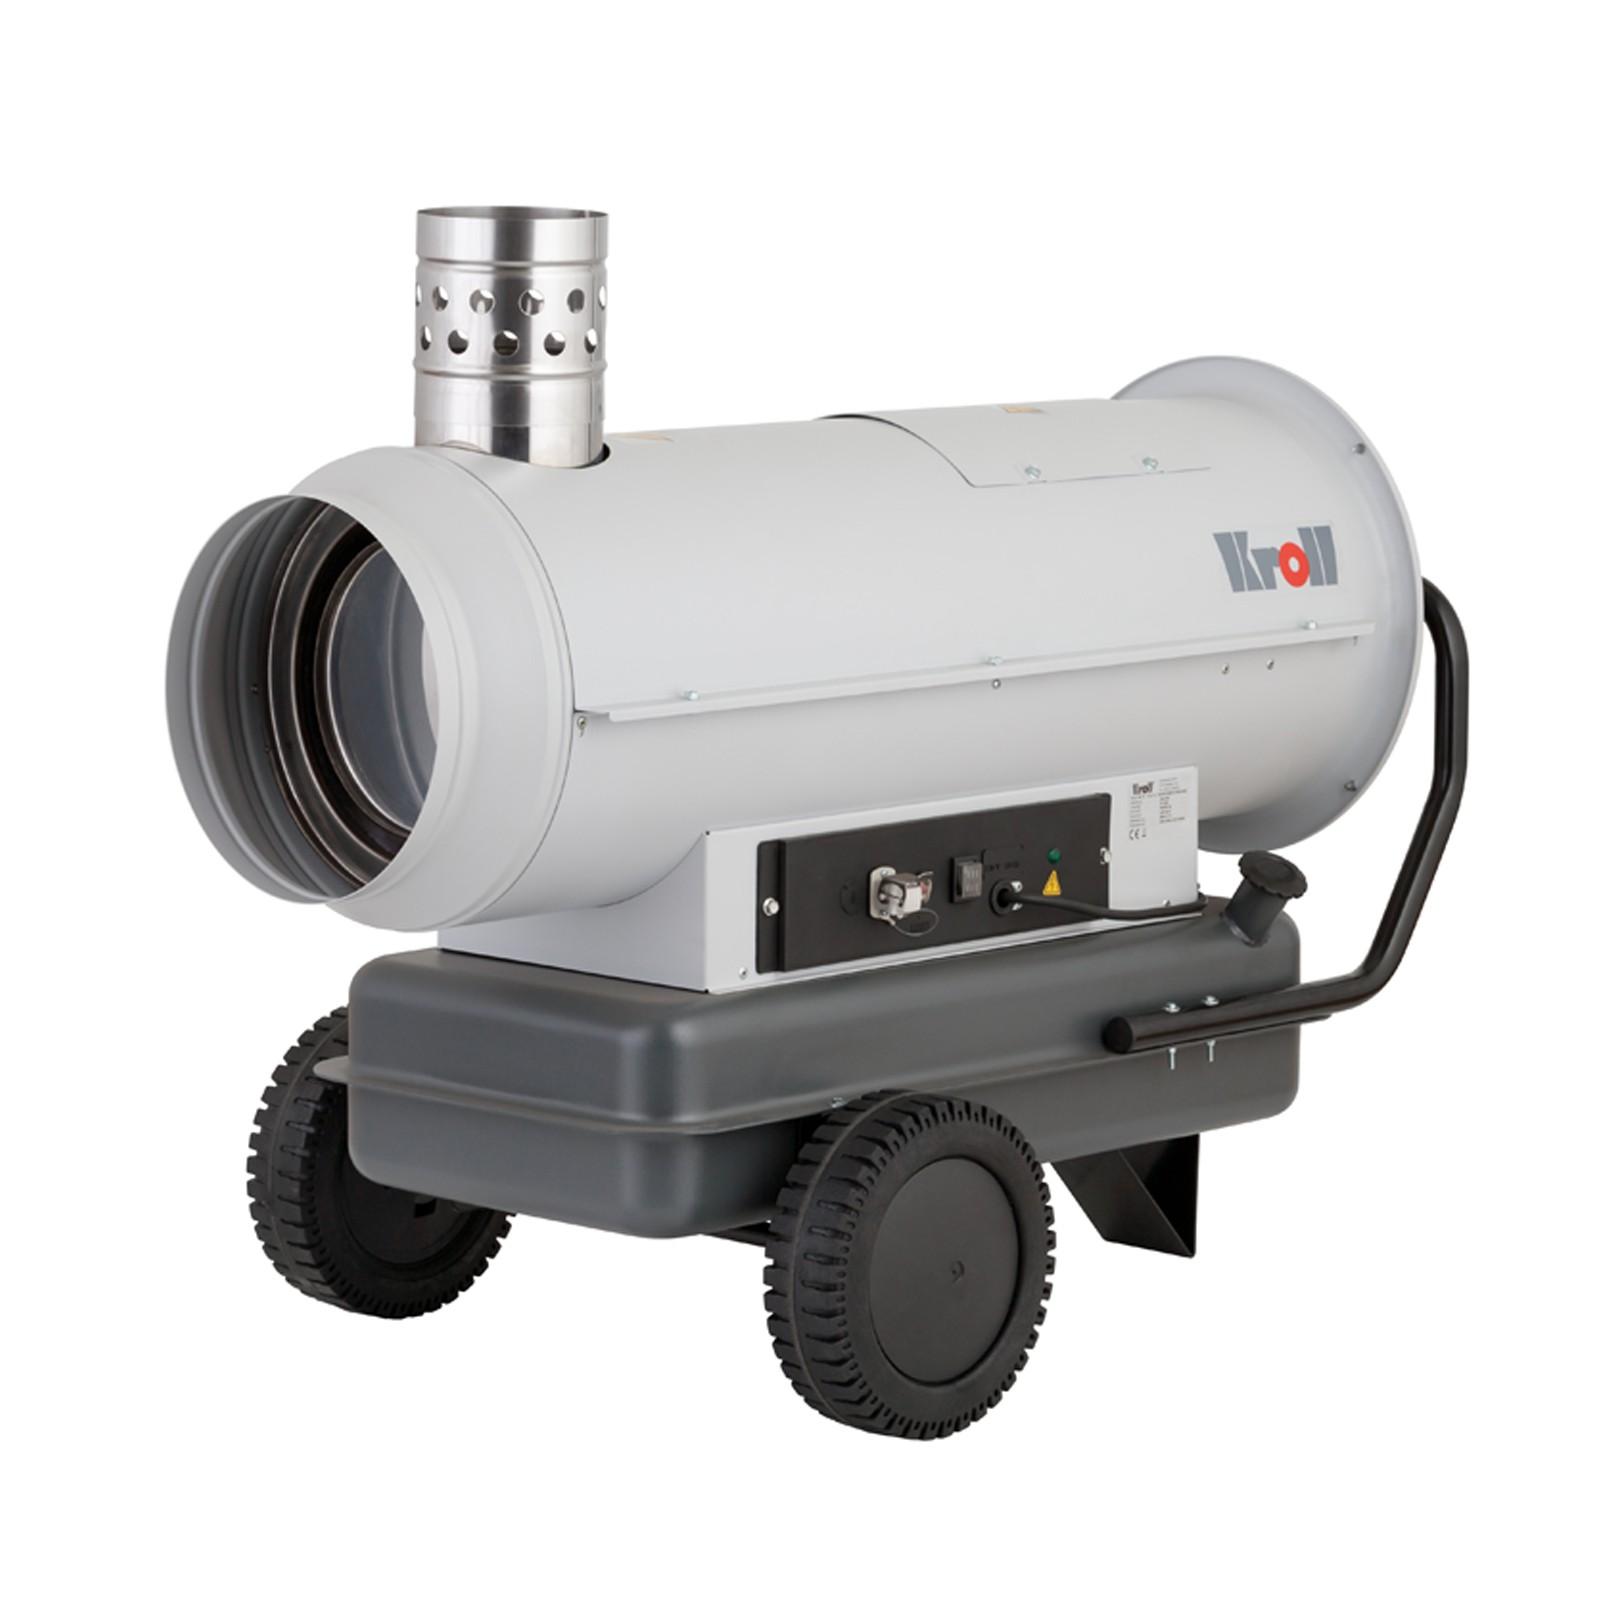 Mobile Öl Diesel Heizkanone MA22 23,4 kW Ölheizgebläse Ölheizgerät